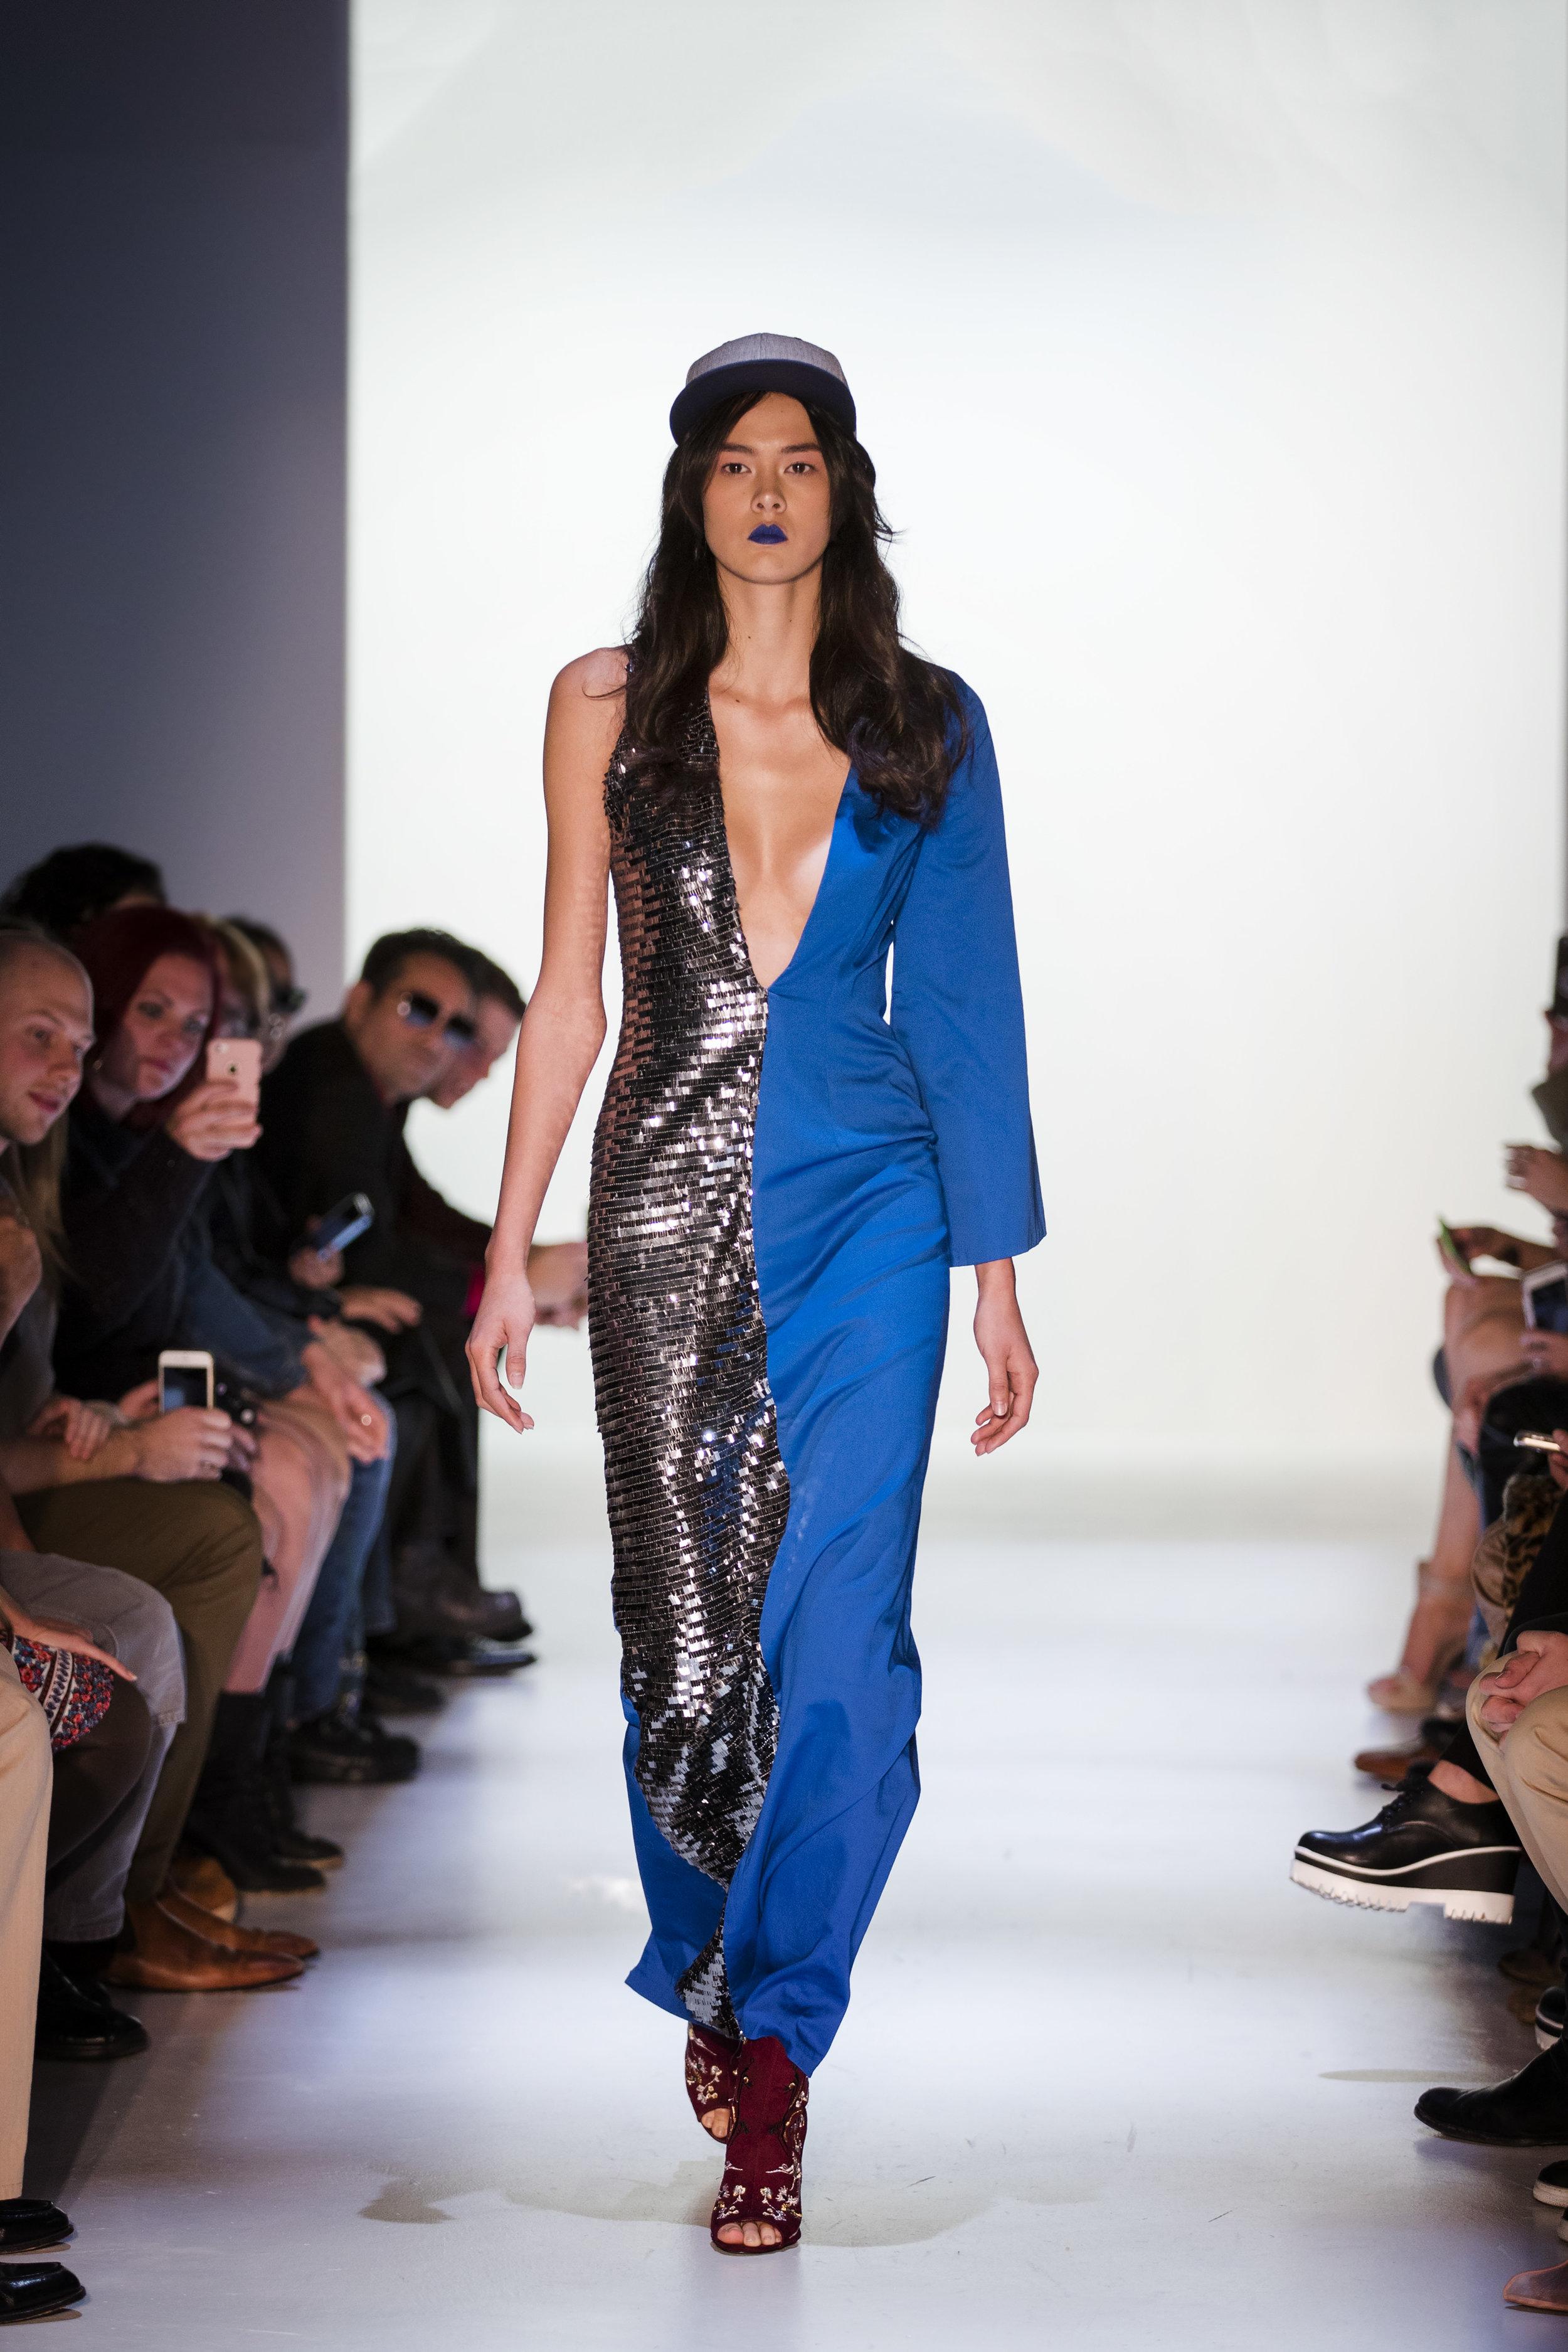 Massif Fashion Week 2017 Day 4 GIA New York Guillermo Irias - 010.jpg